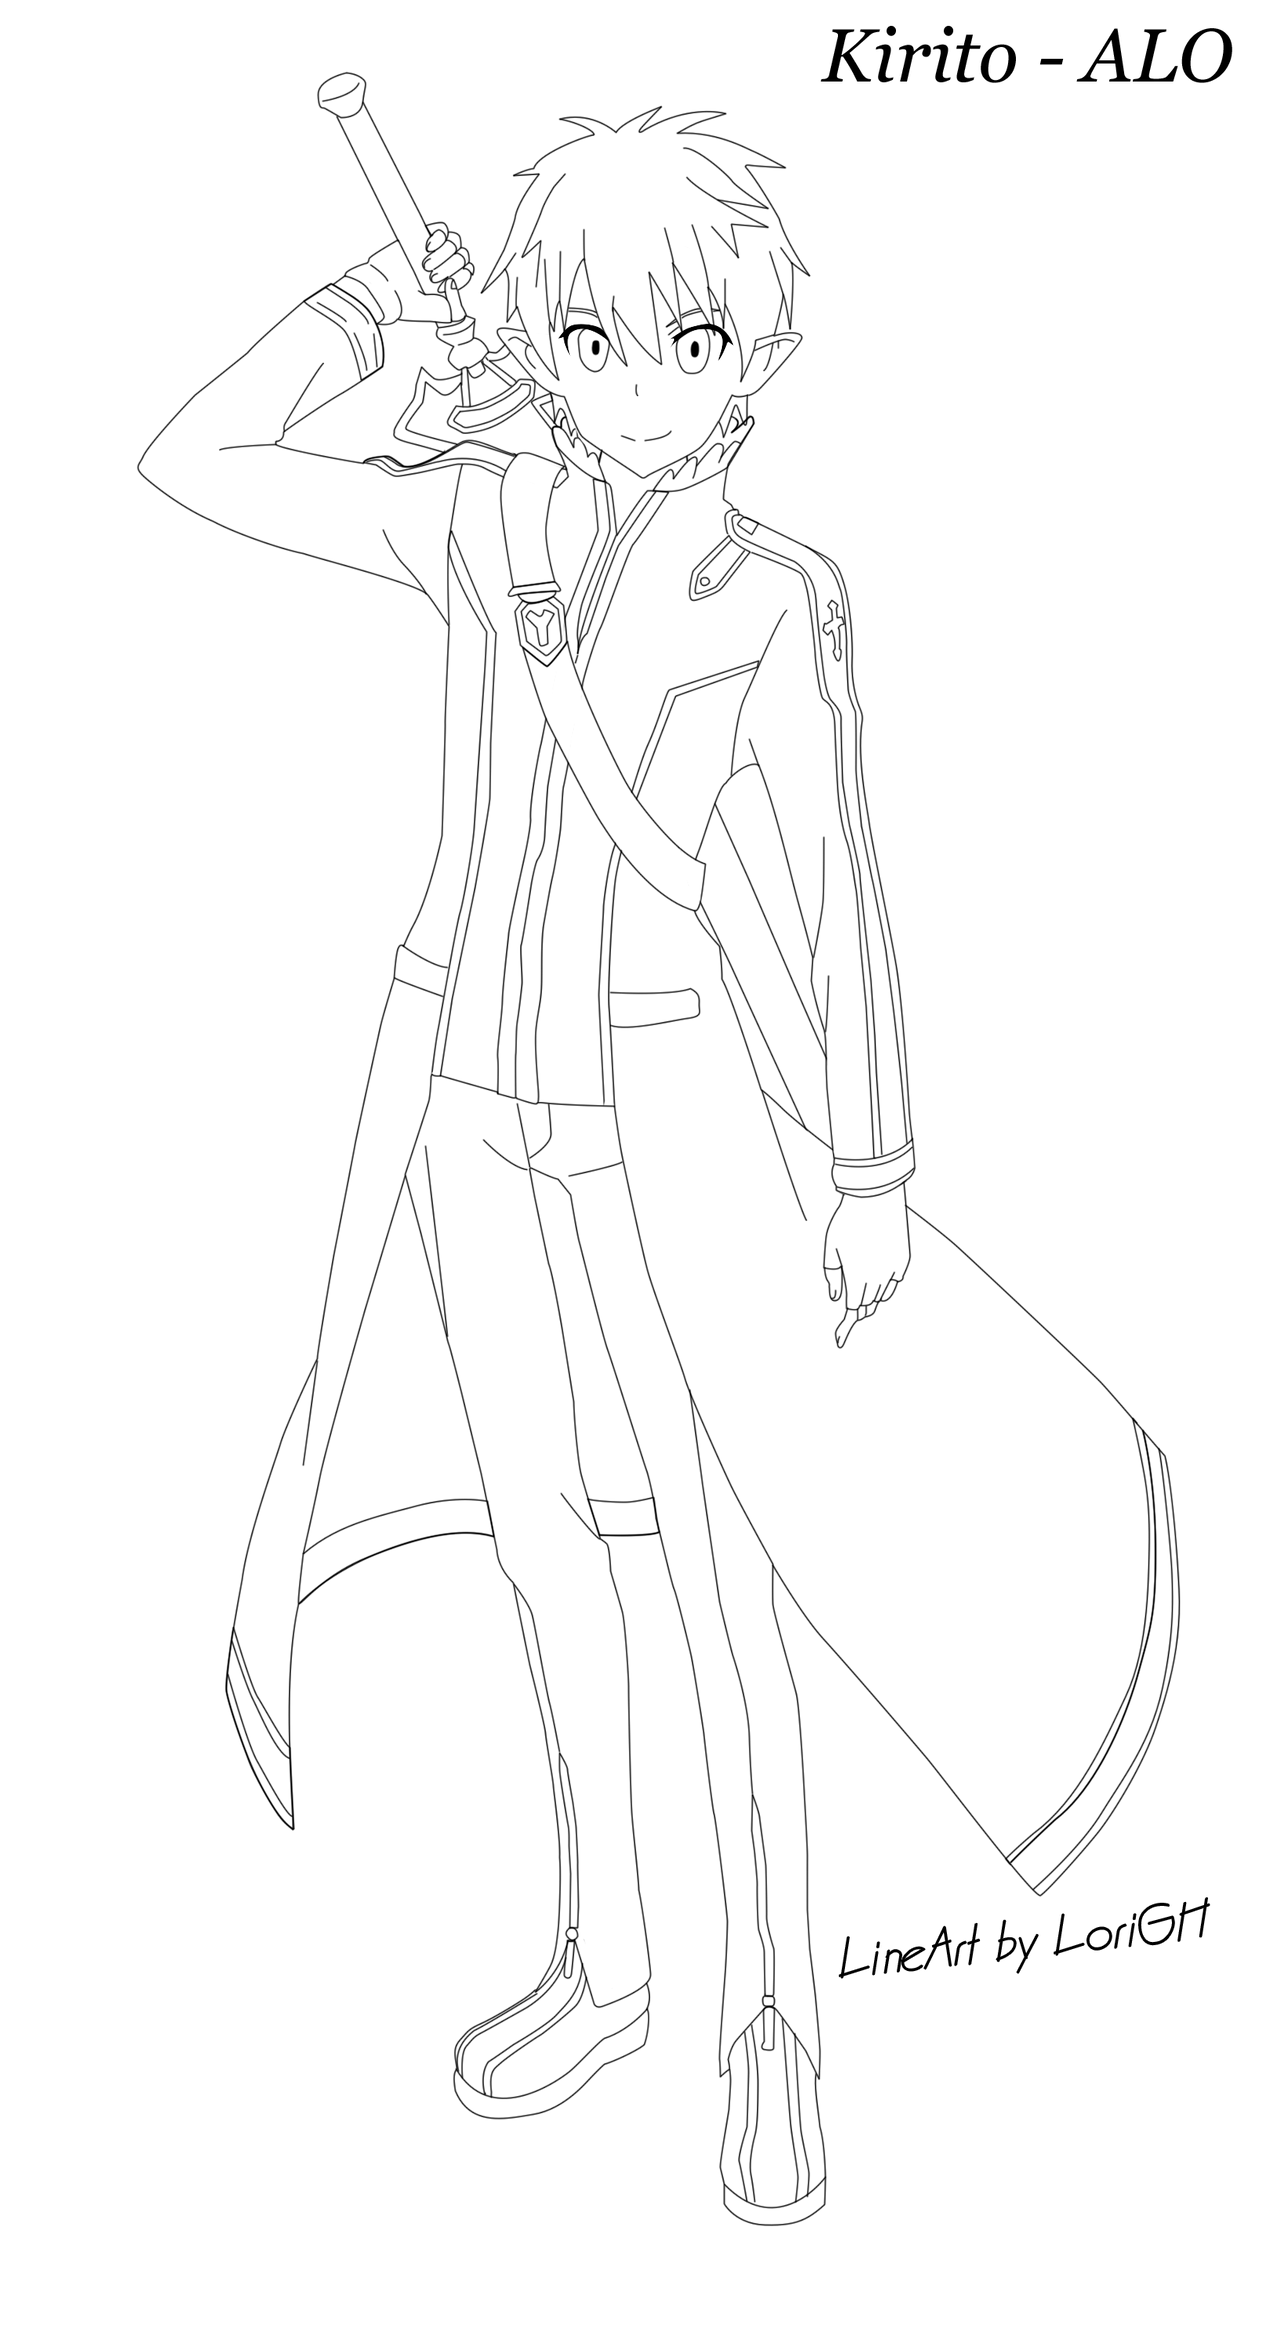 Kirito Lineart : Lineart kirito alo season by lorigh on deviantart